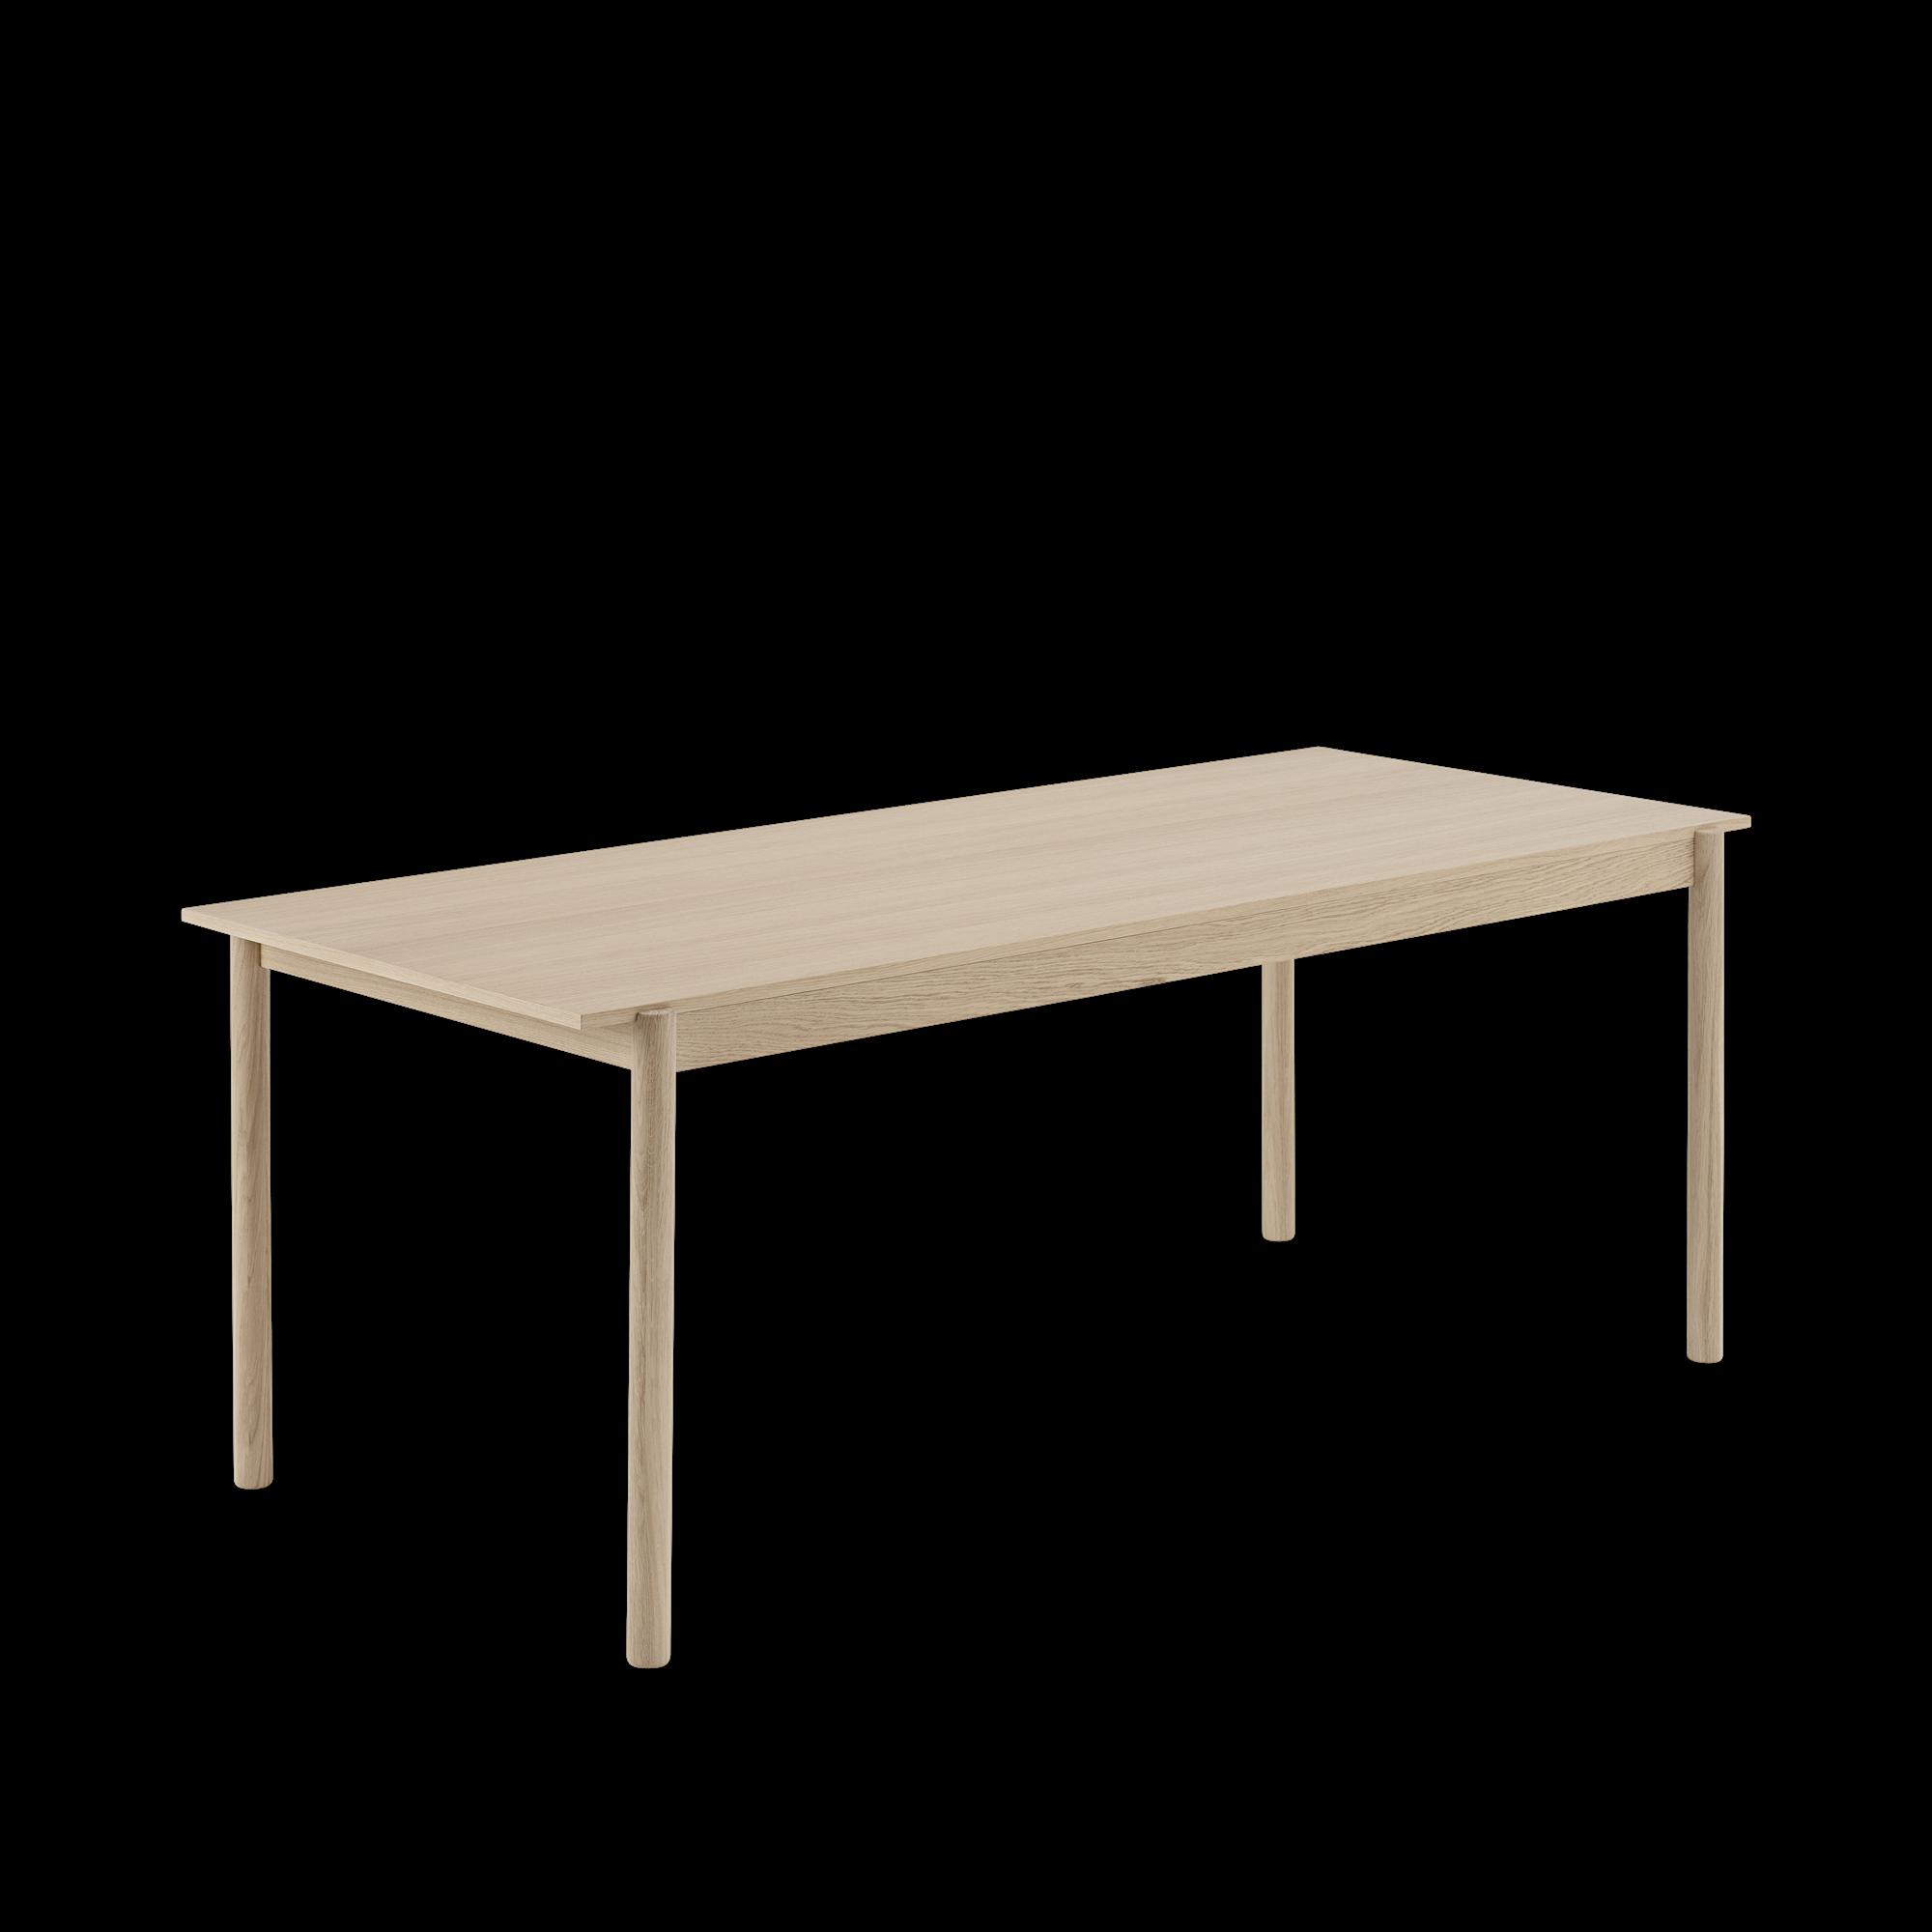 Woood Eettafel Bankje.Linear Wood Eettafel